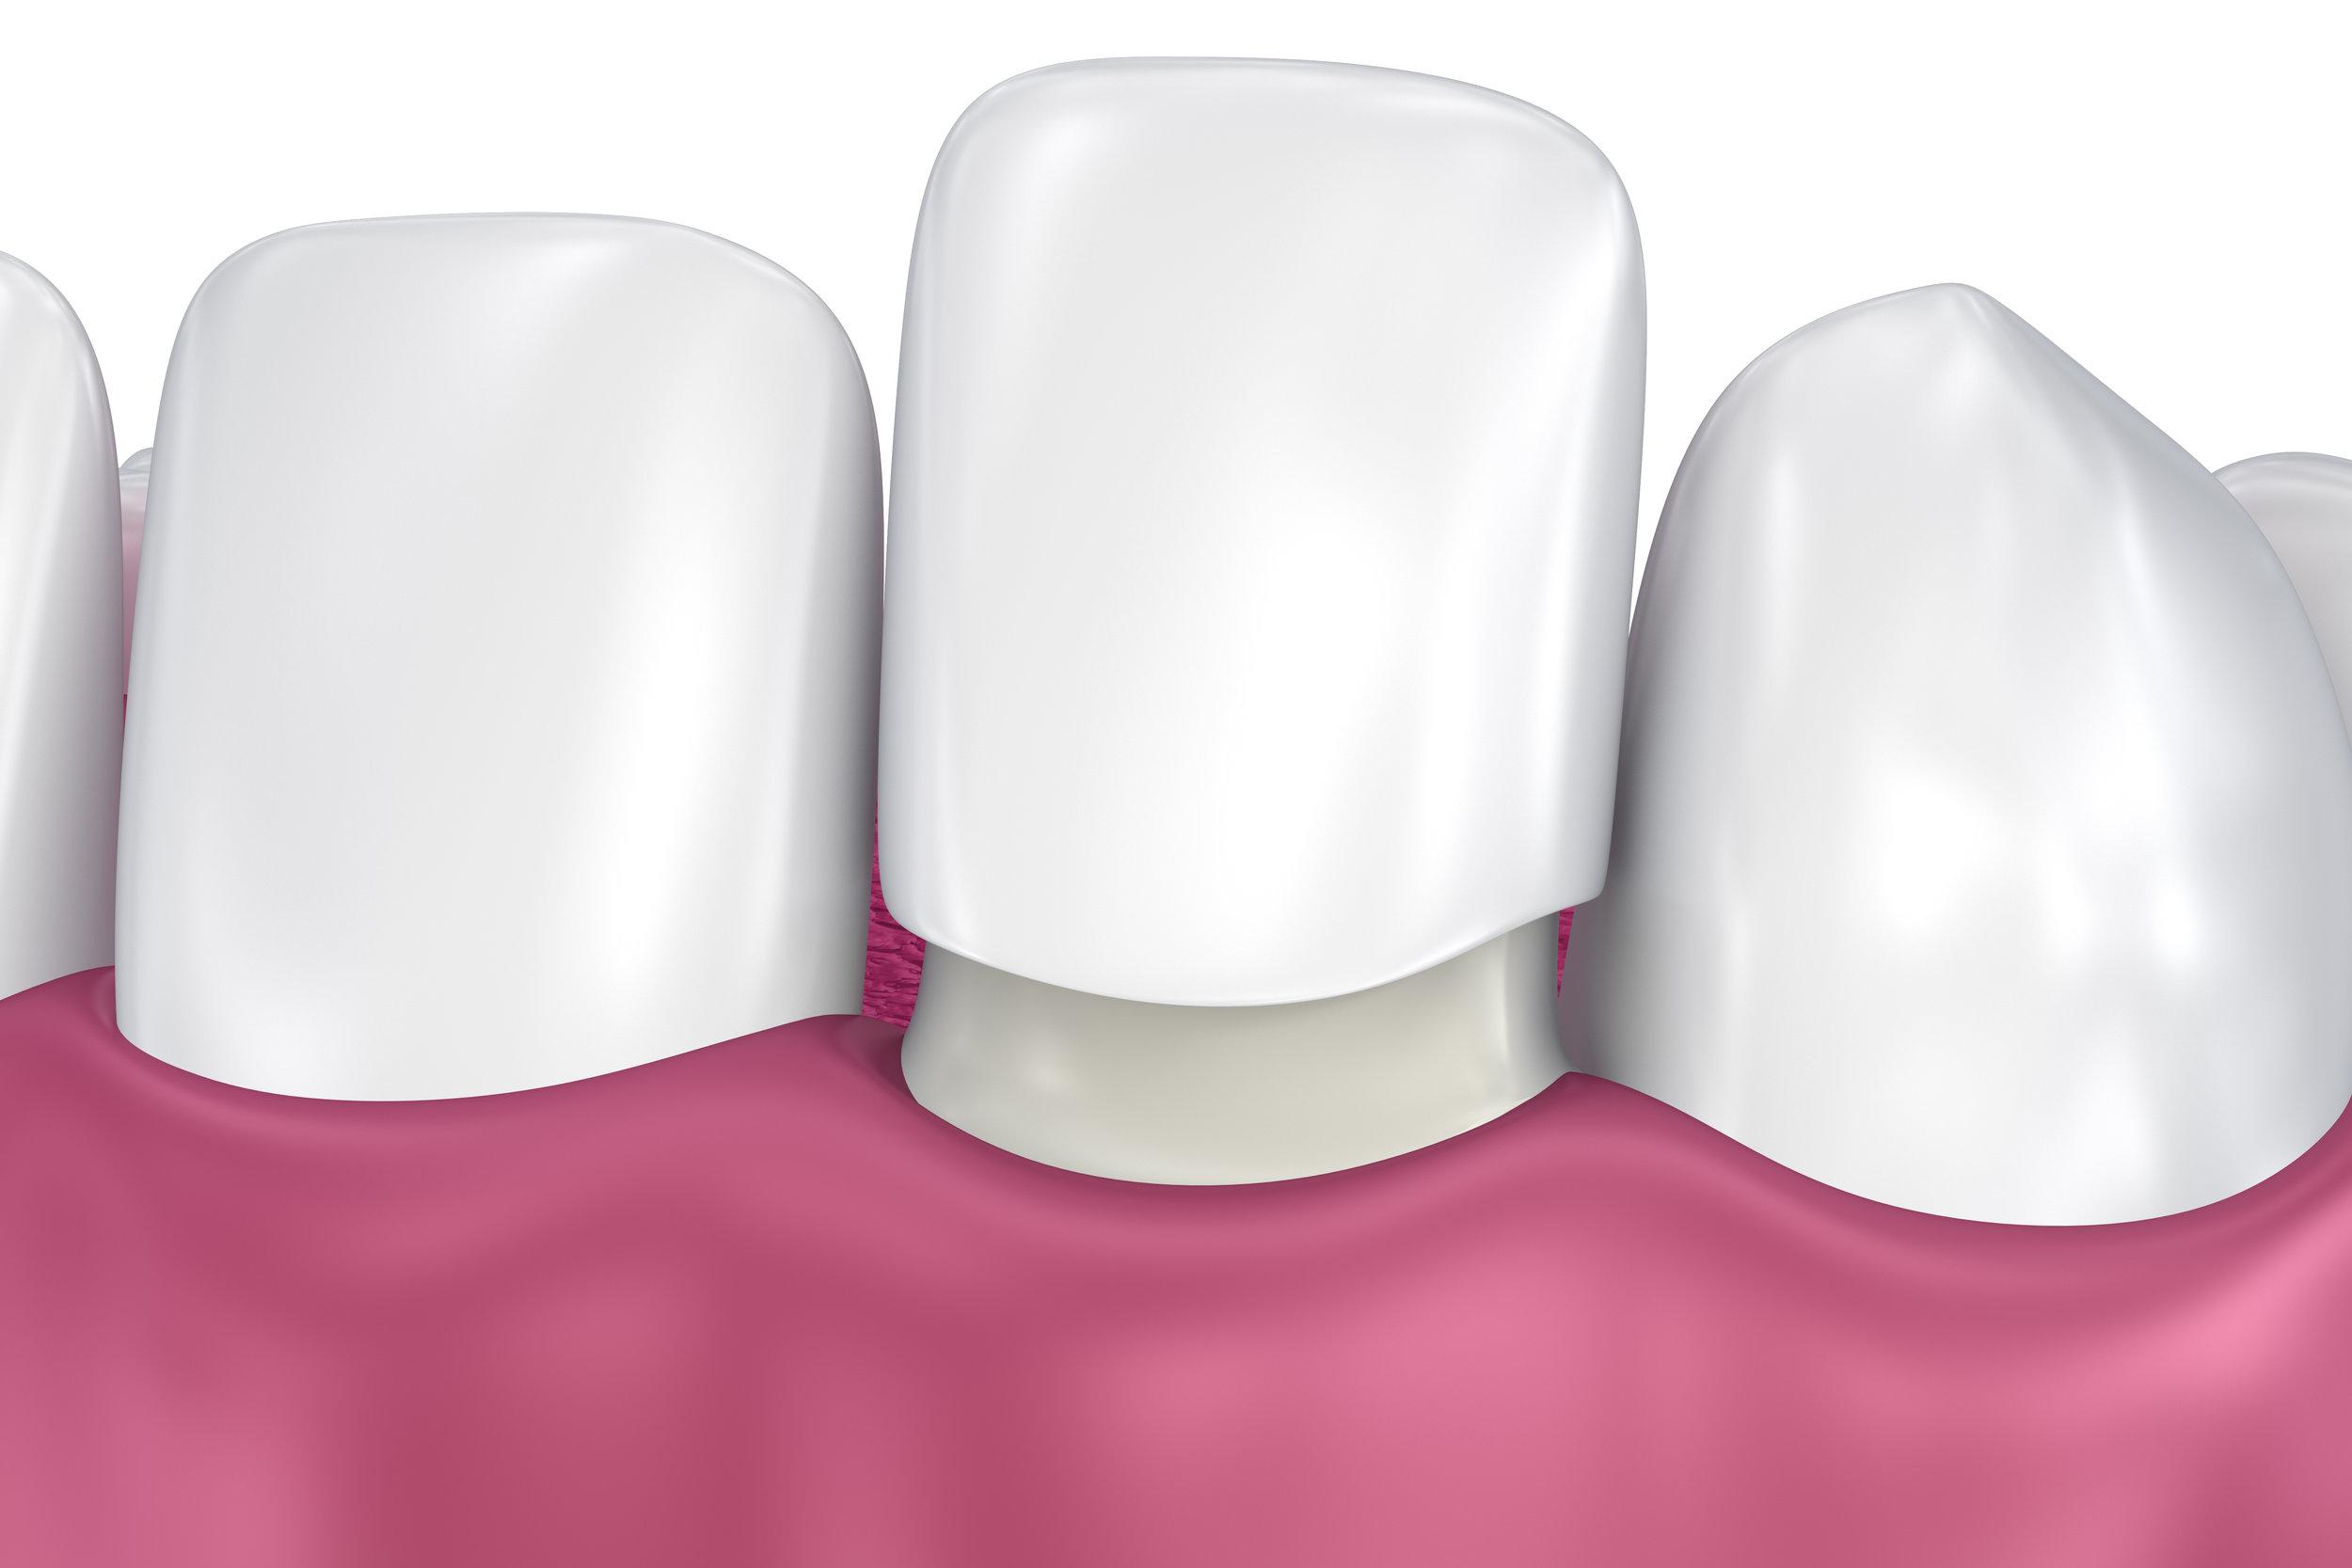 Canva - Dental Veneers_ Porcelain Veneer installation Procedure. 3D illustration.jpg